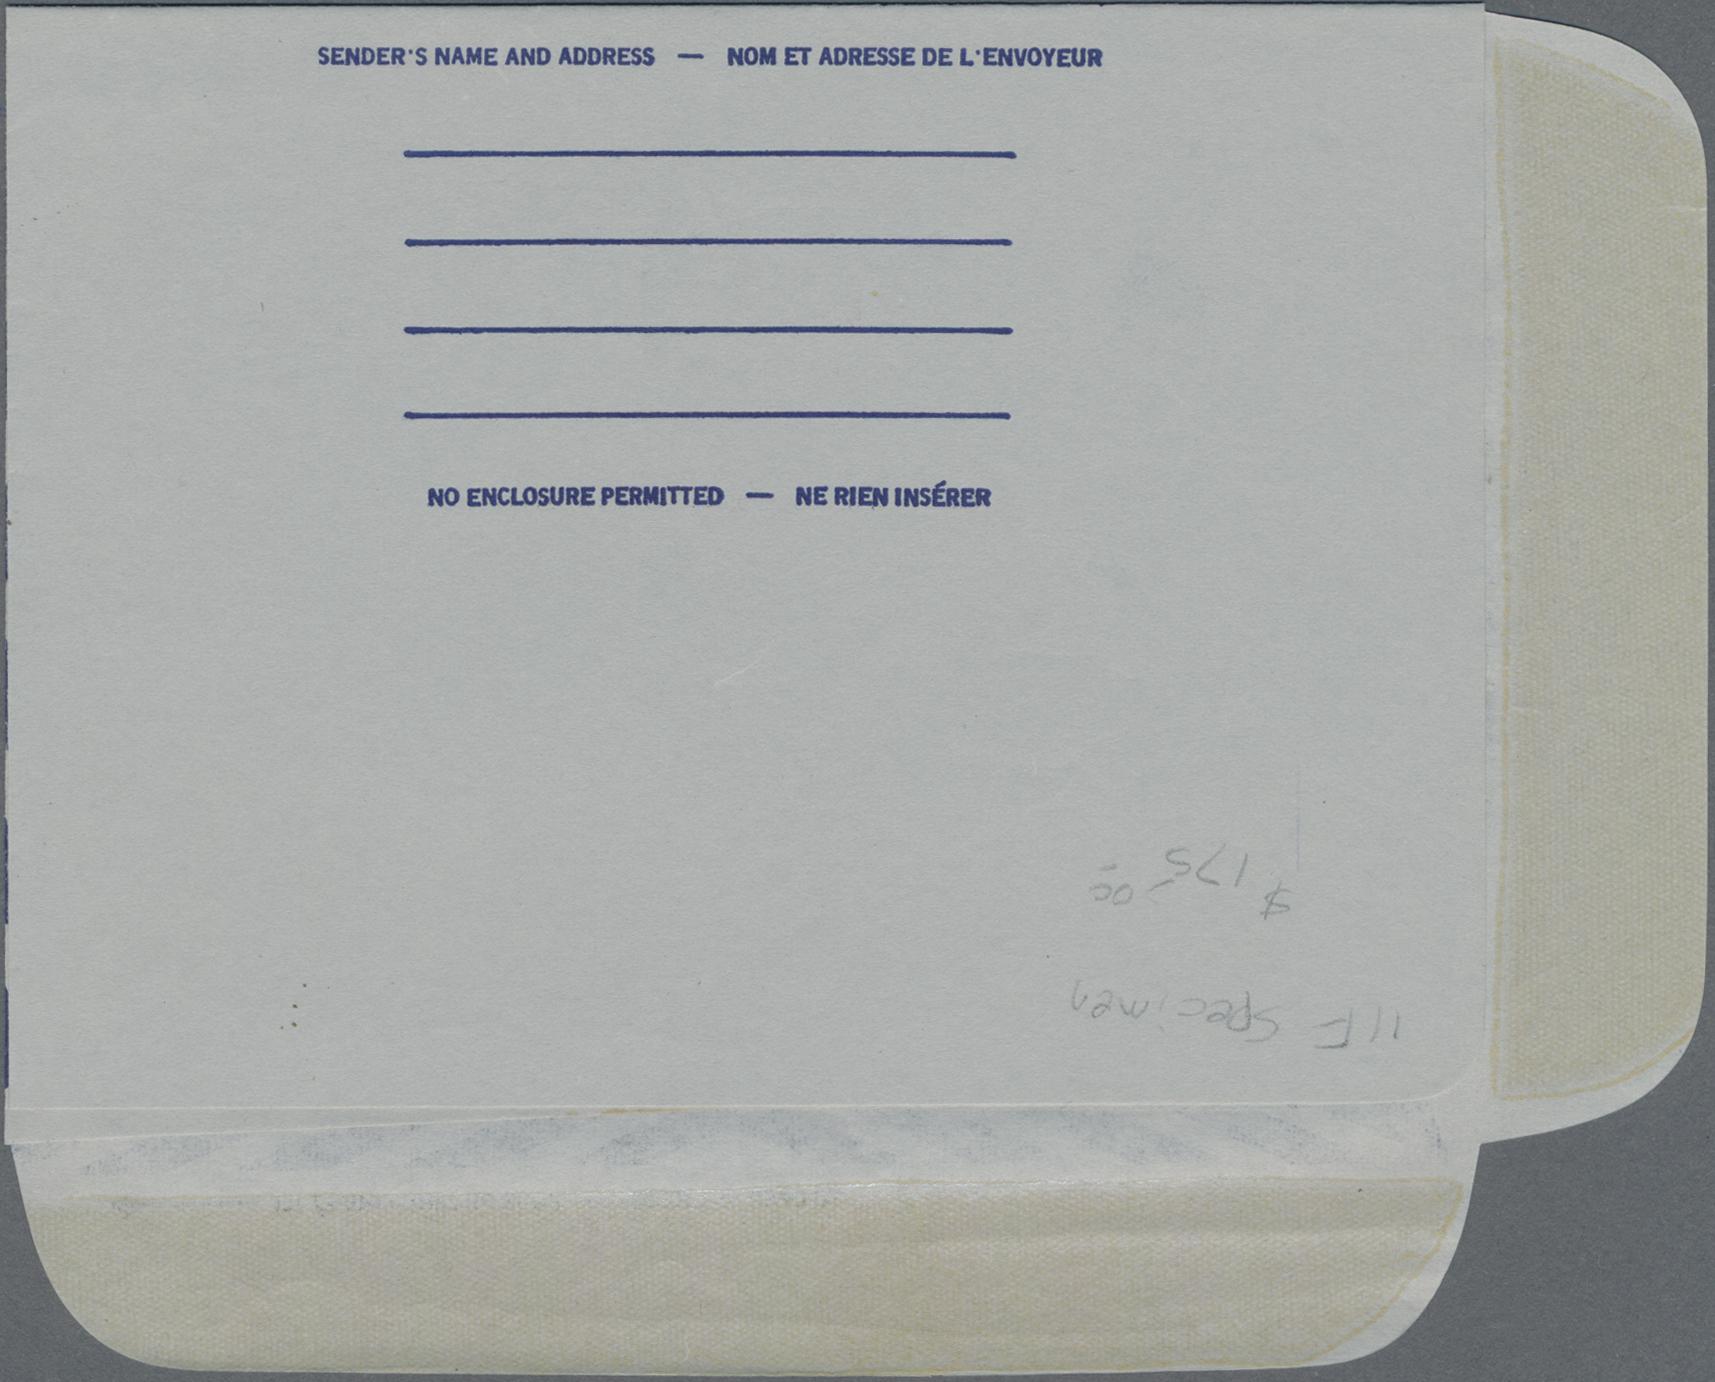 Lot 00813 - Canada - Ganzsachen  -  Auktionshaus Christoph Gärtner GmbH & Co. KG Special auction